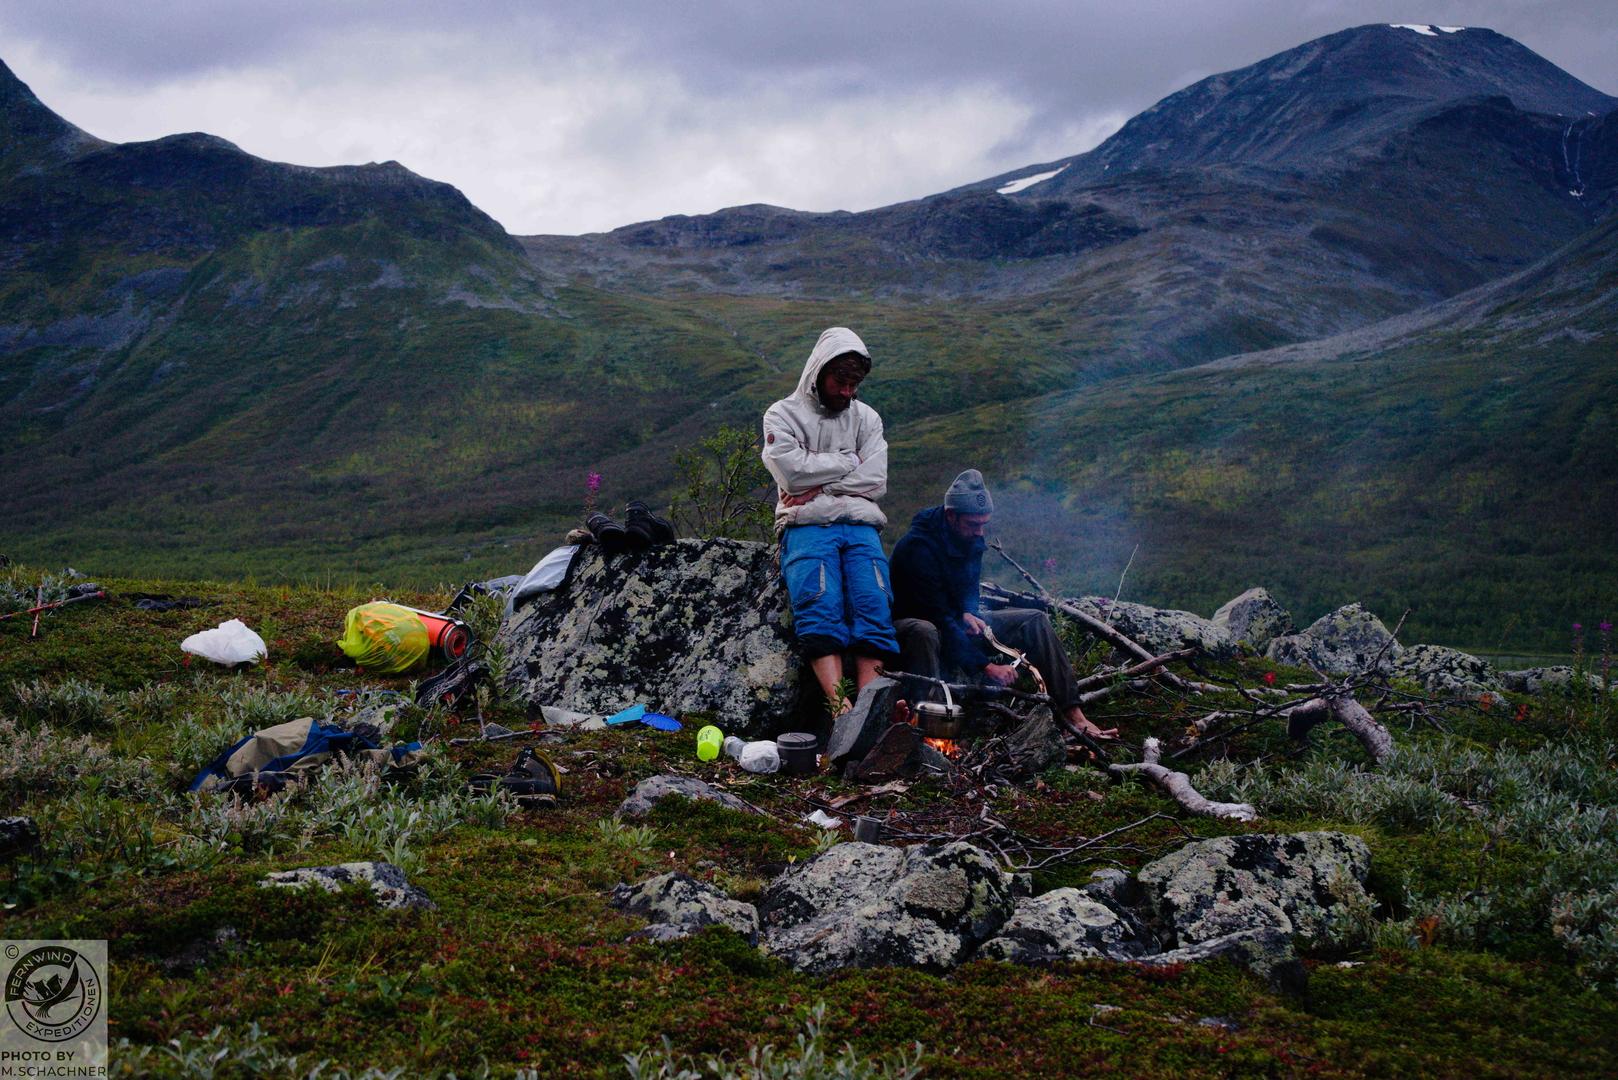 fernwind schweden sarek scouting trekking expedition Camplife